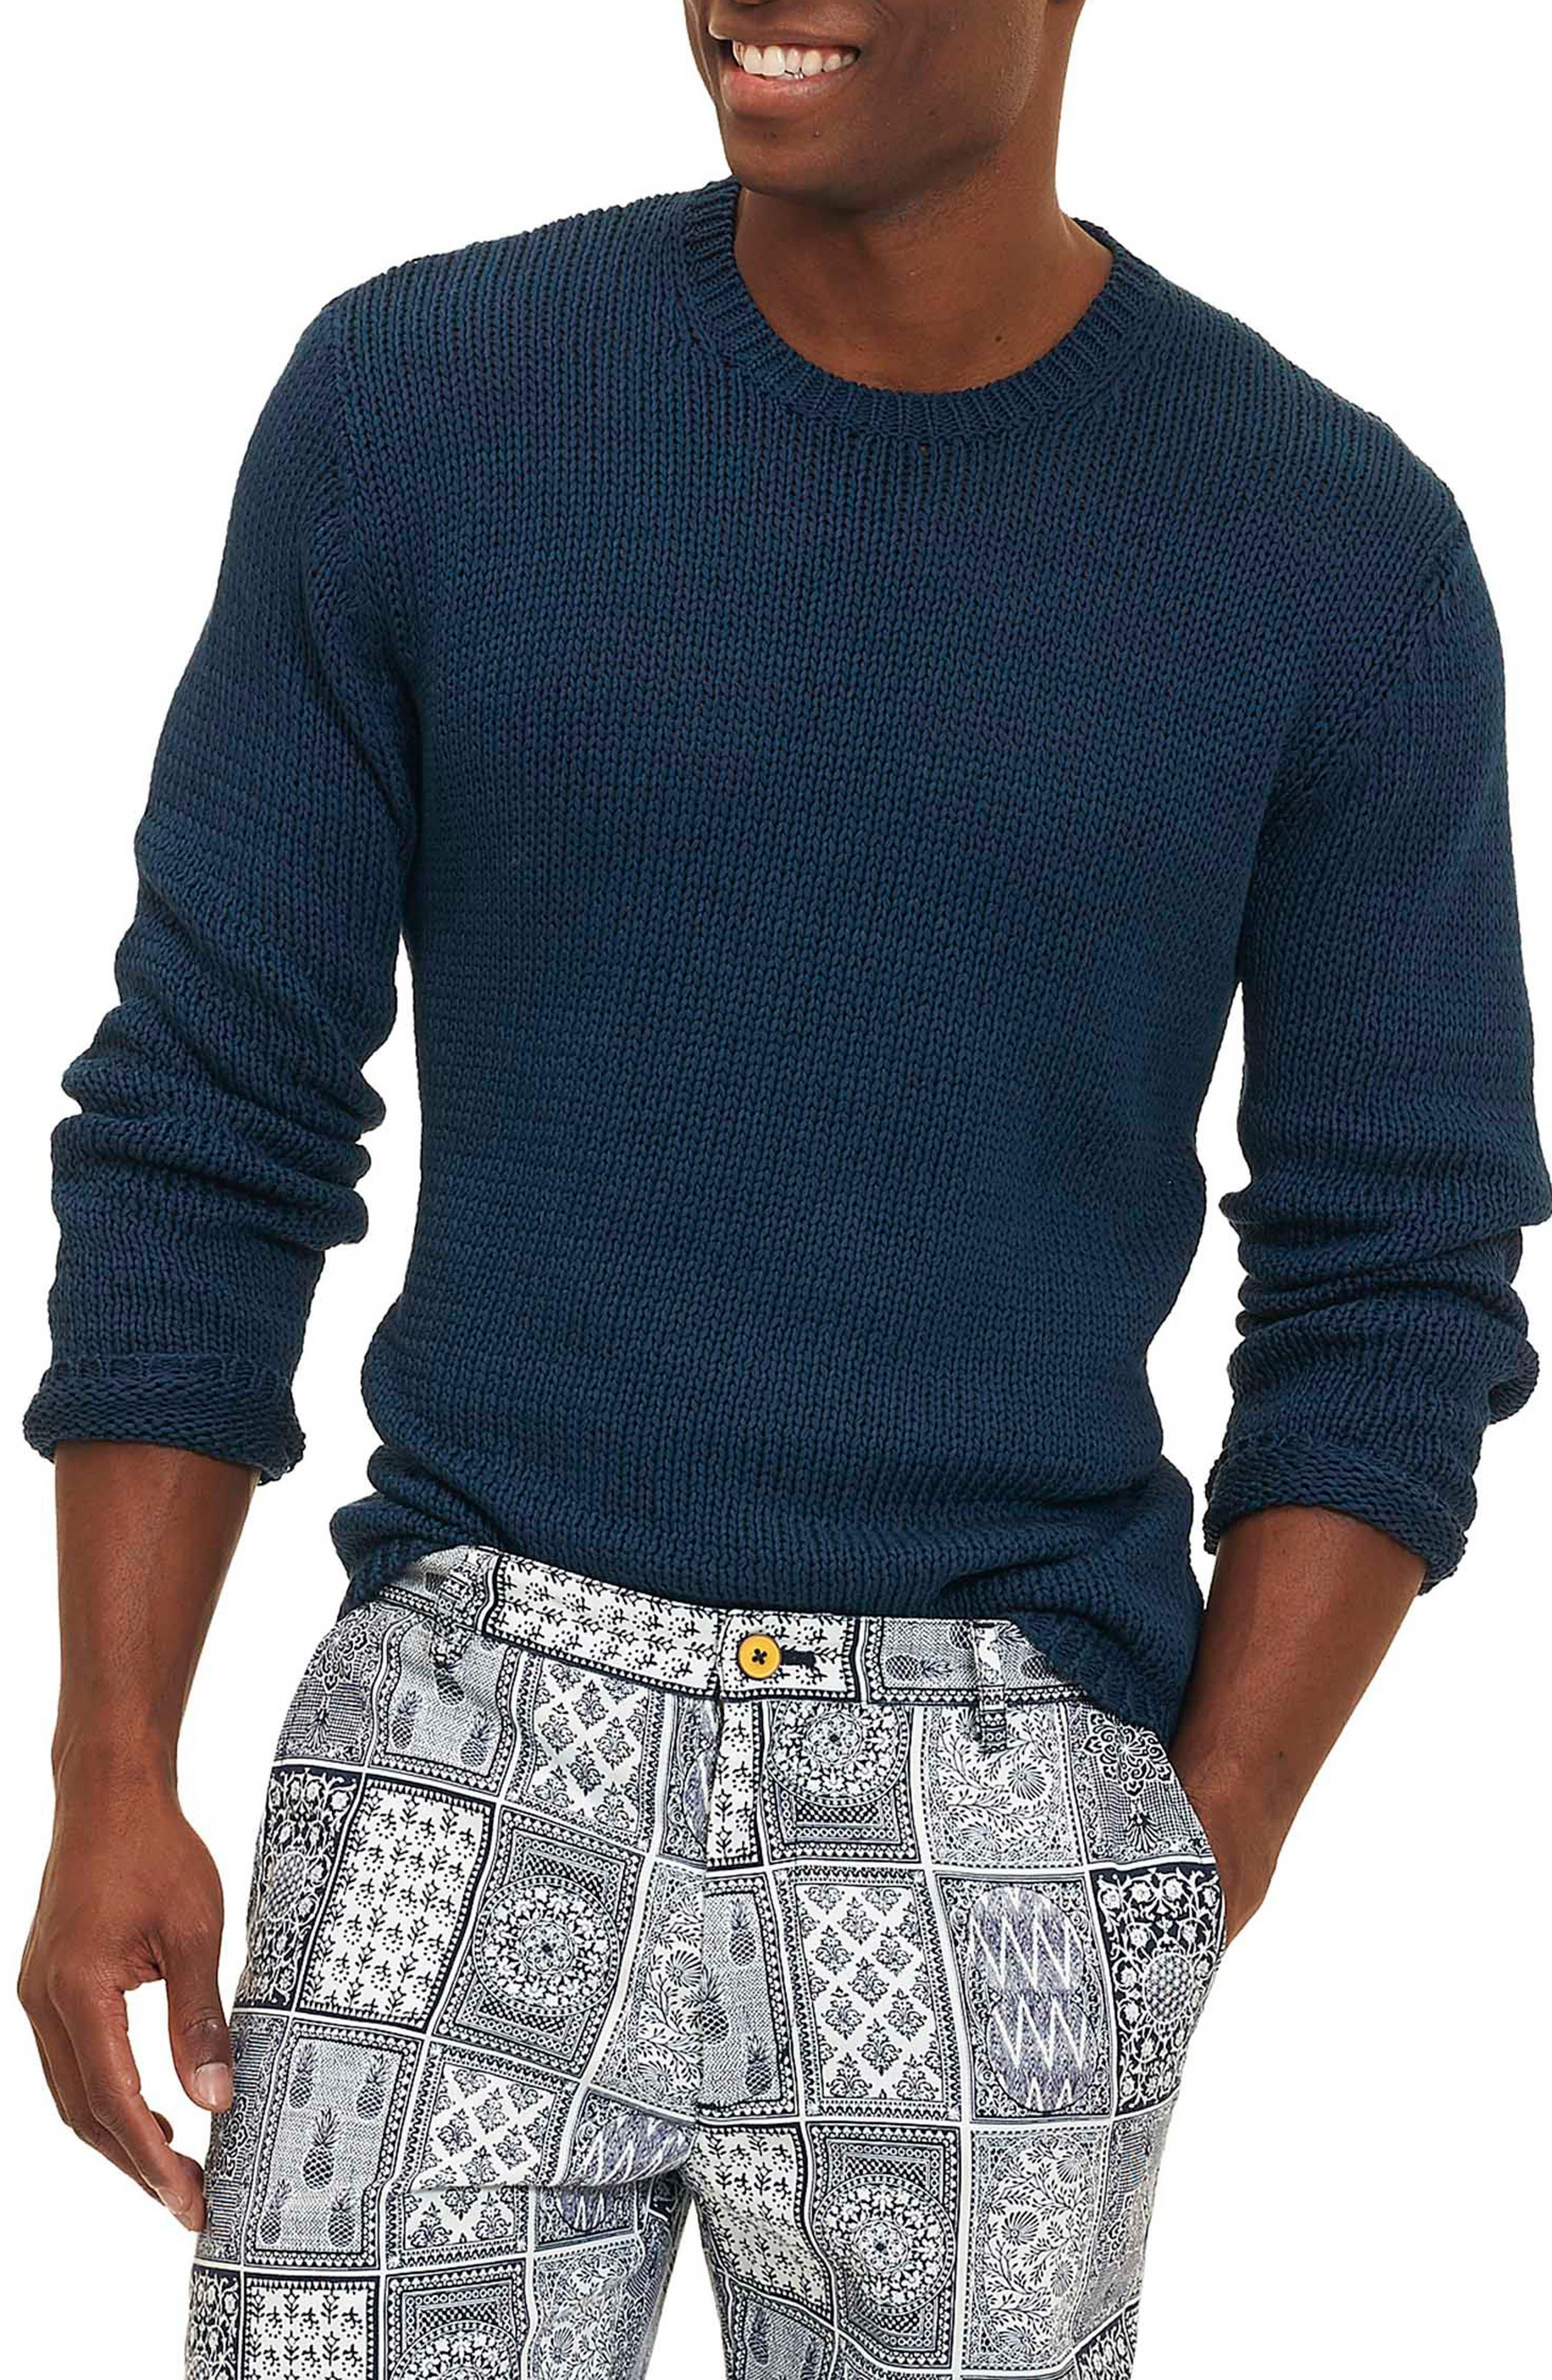 Keratons Sweater,                         Main,                         color, Blue